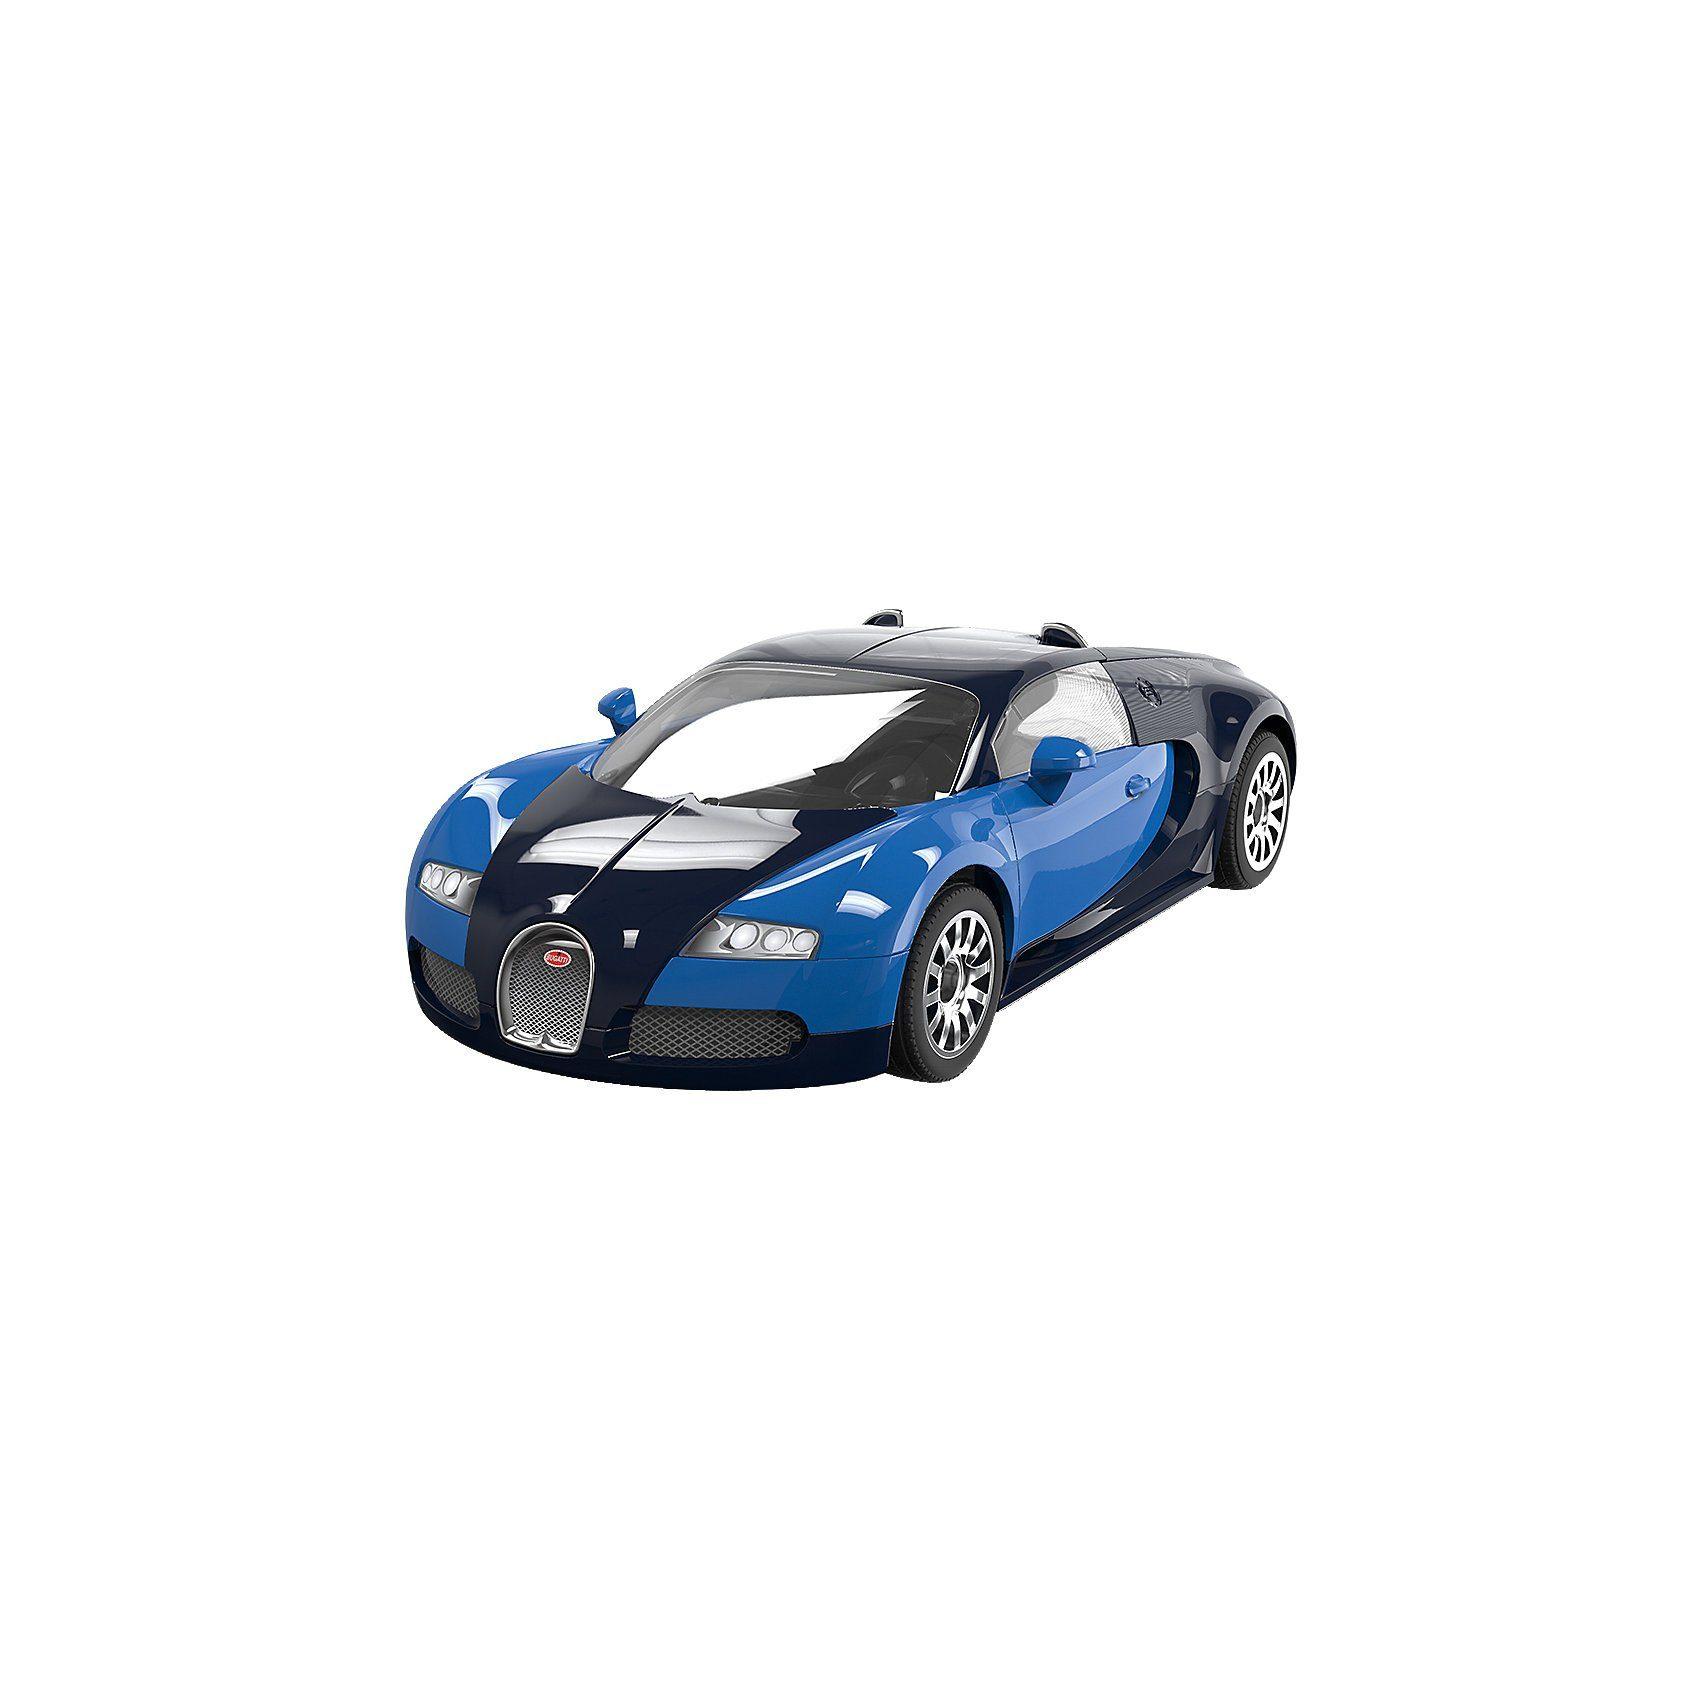 Glow2B Airfix Quickbuild-Bugatti Veyron